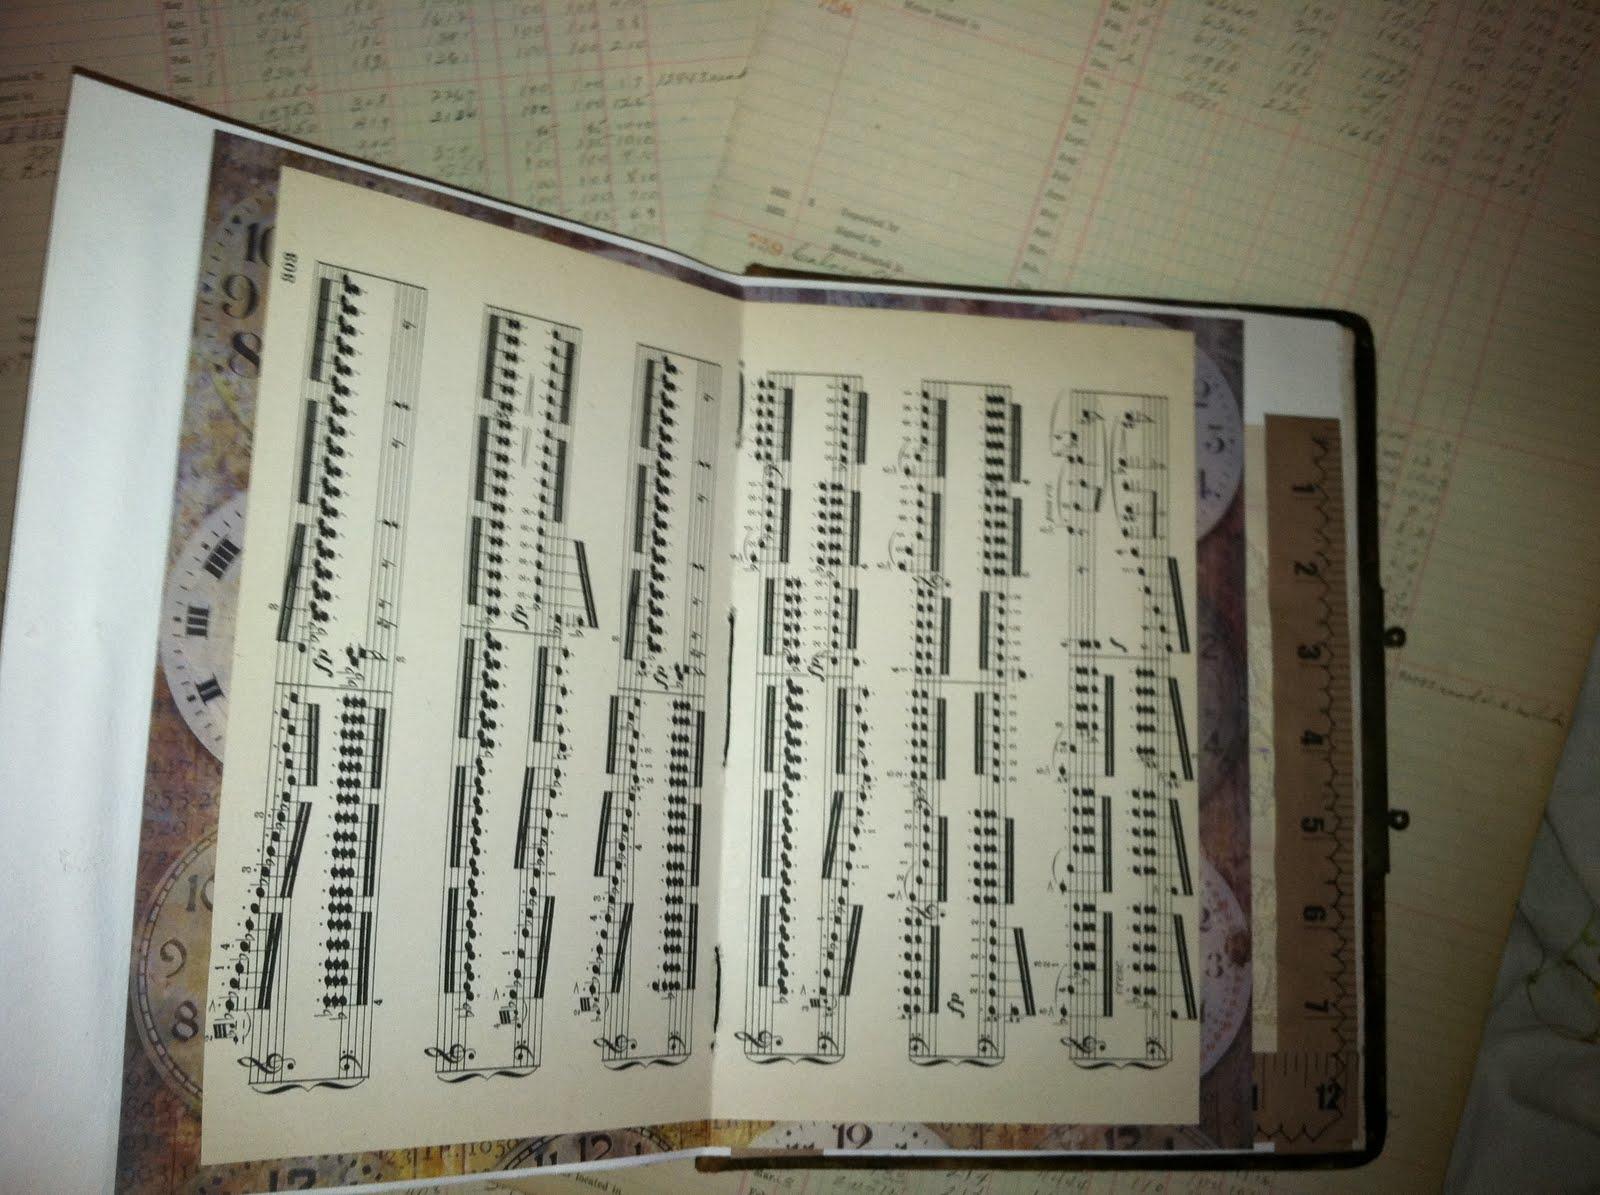 http://2.bp.blogspot.com/-yNcJhmraUs4/TkFrHwrXQ0I/AAAAAAAAA9I/_UxOG0TzMUw/s1600/Leather+Antique+Pao+Album+Journal+027.JPG